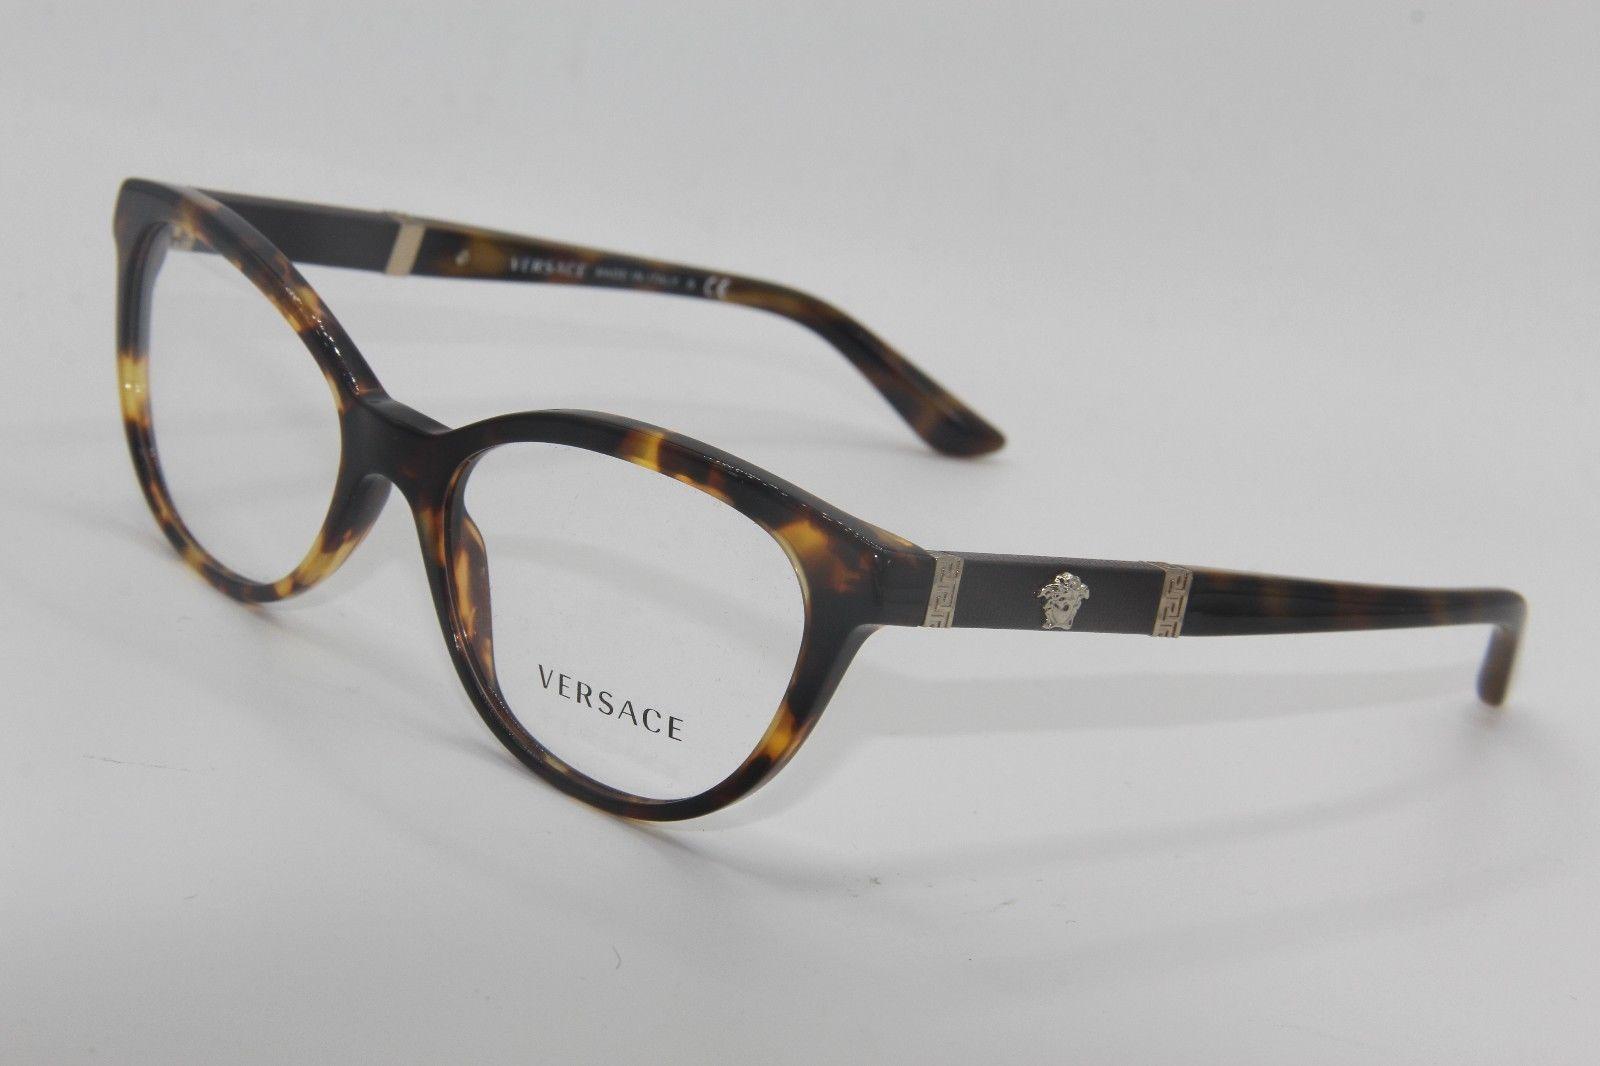 9fef20e403ec New Versace Mod. 3219-Q 5148 Eyeglasses and 50 similar items. 57